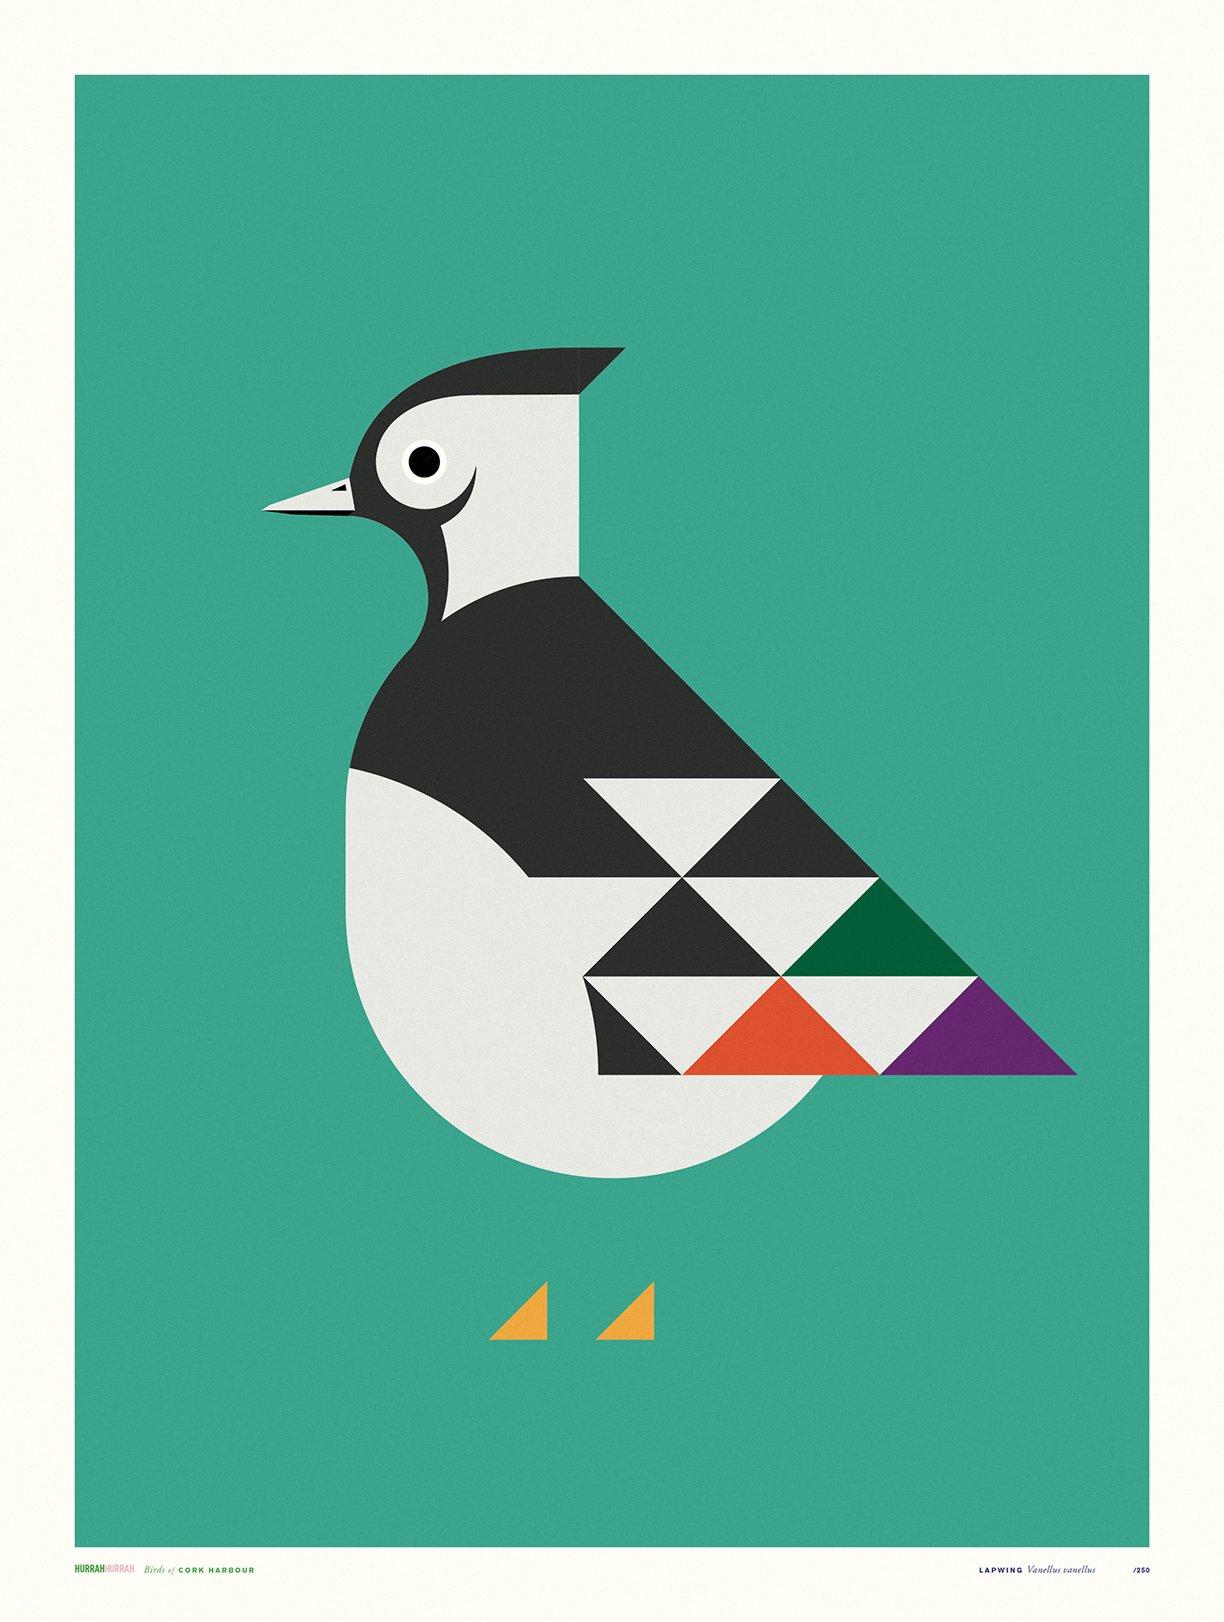 Lapwing / Cork Harbour Bird Series